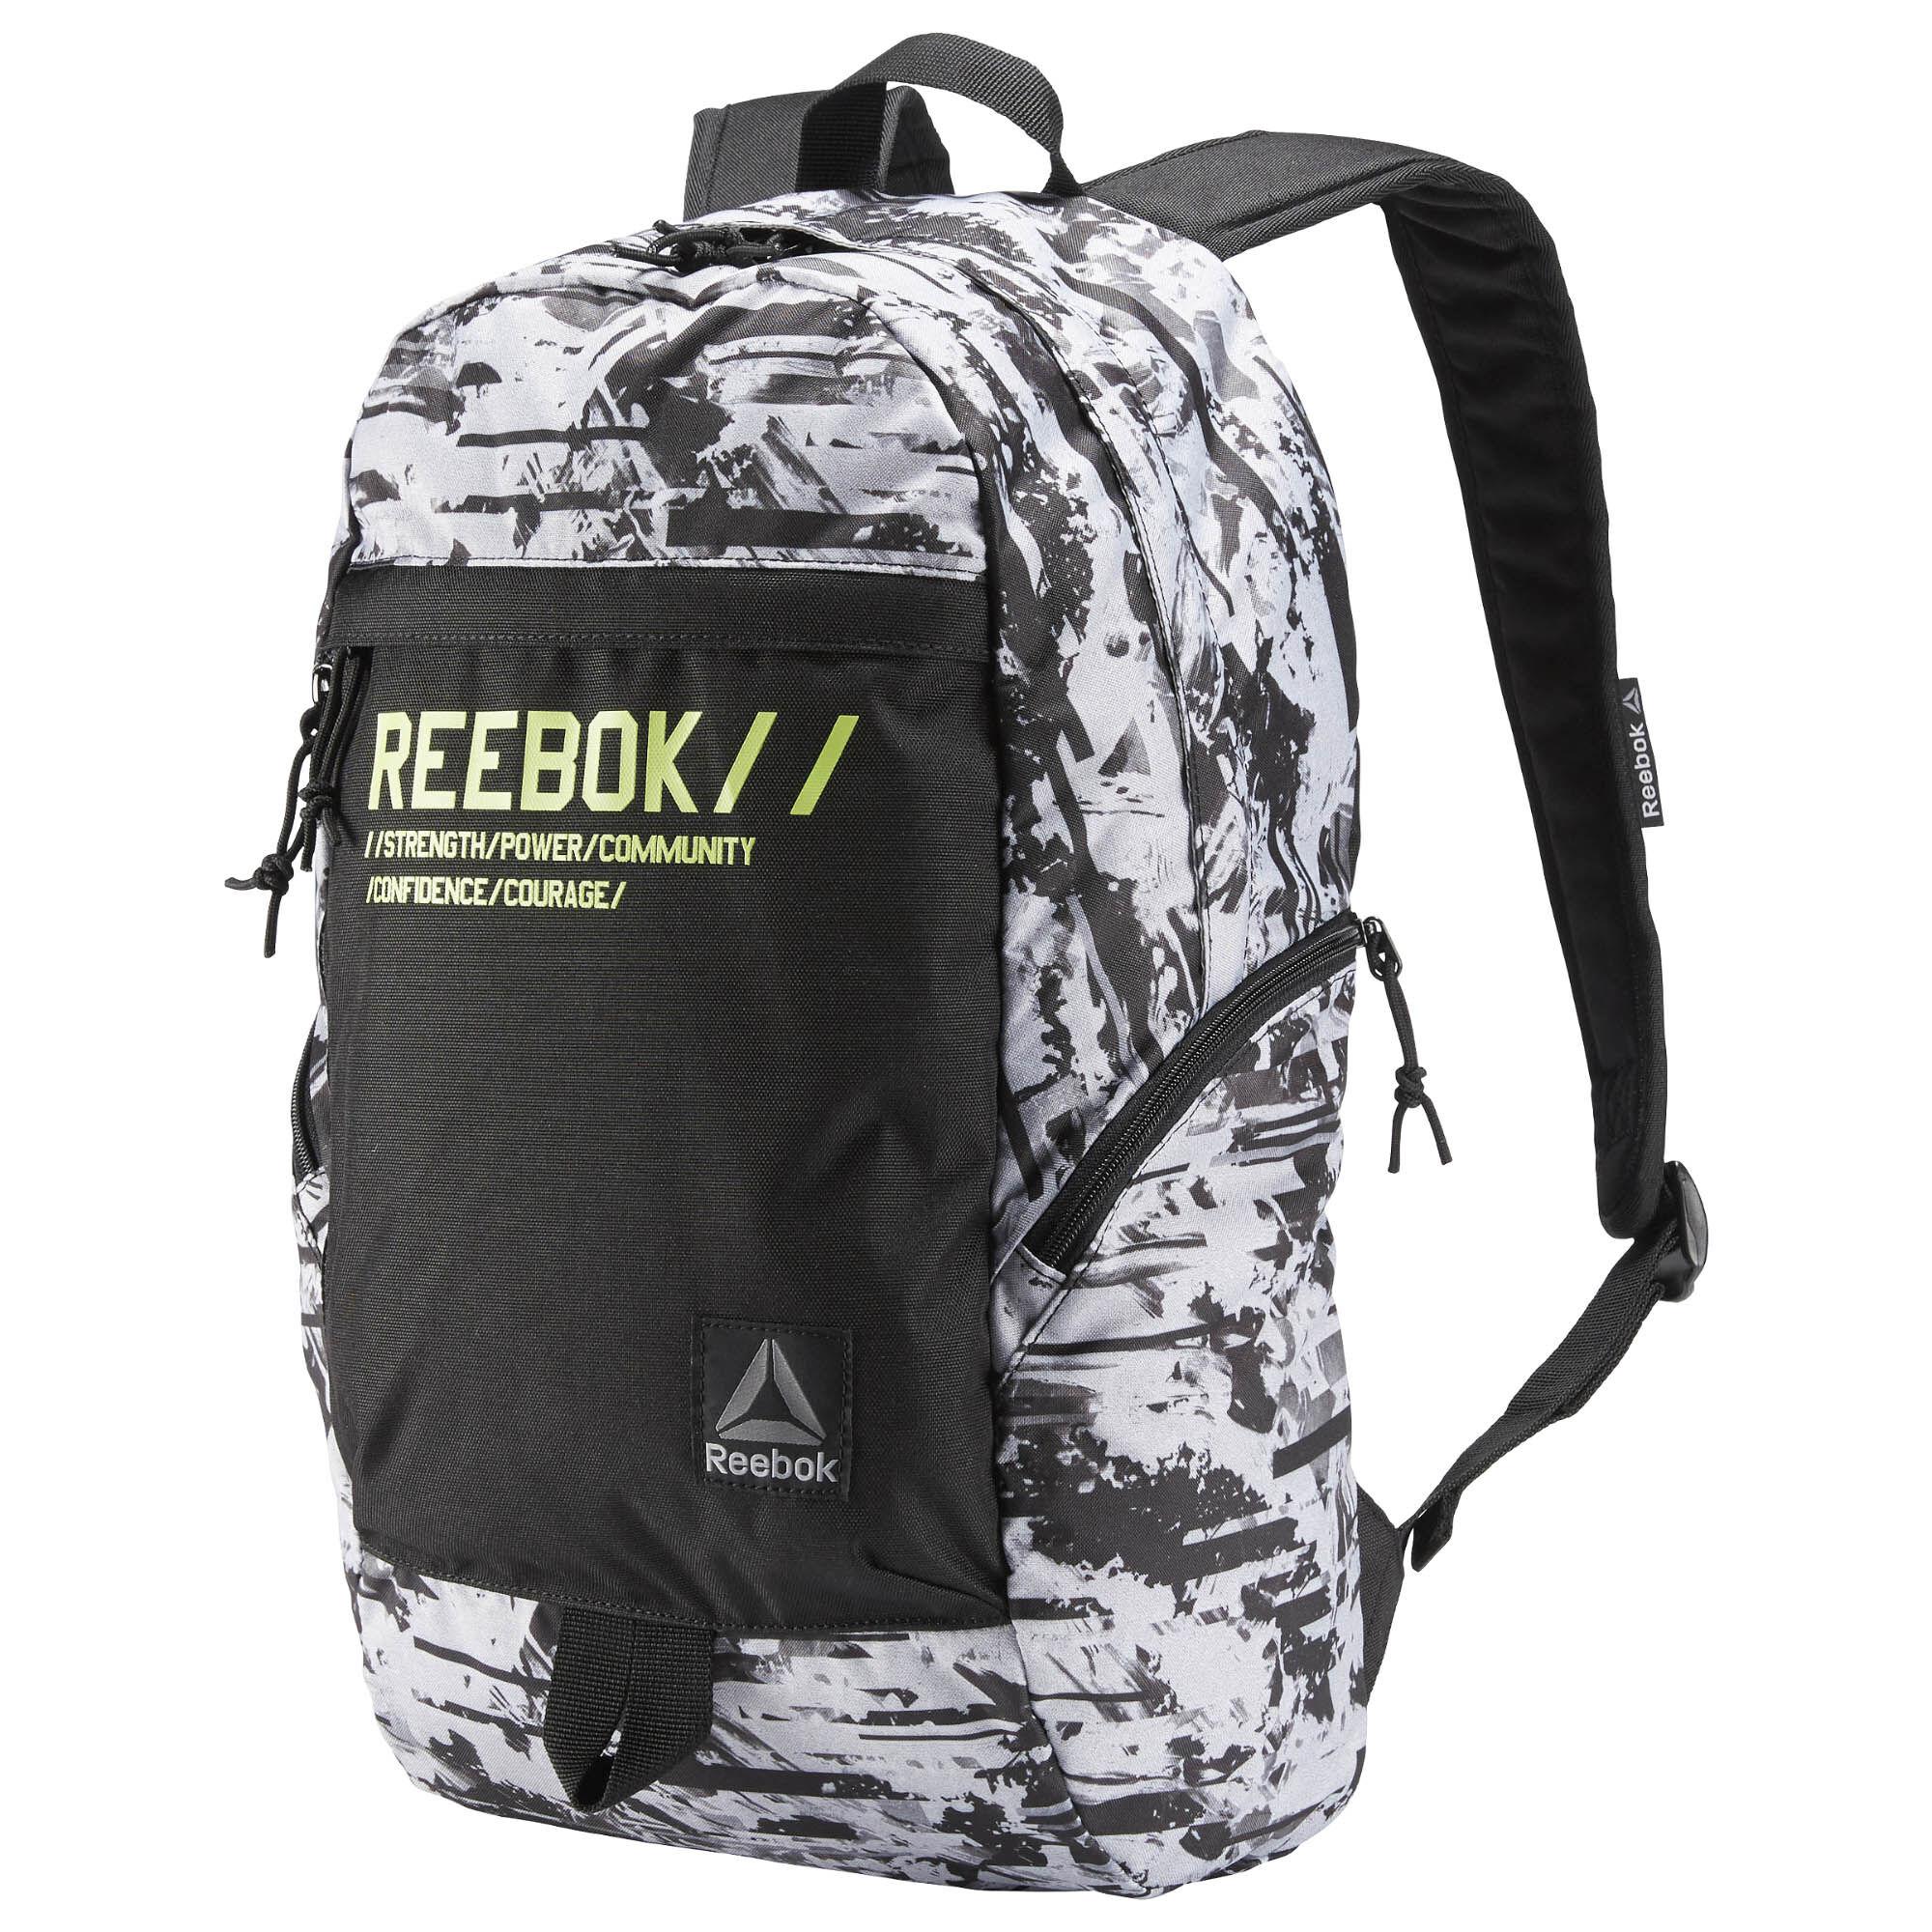 Reebok Foundation Medium Backpack - Black | Reebok MLT  |Reebok Backpack